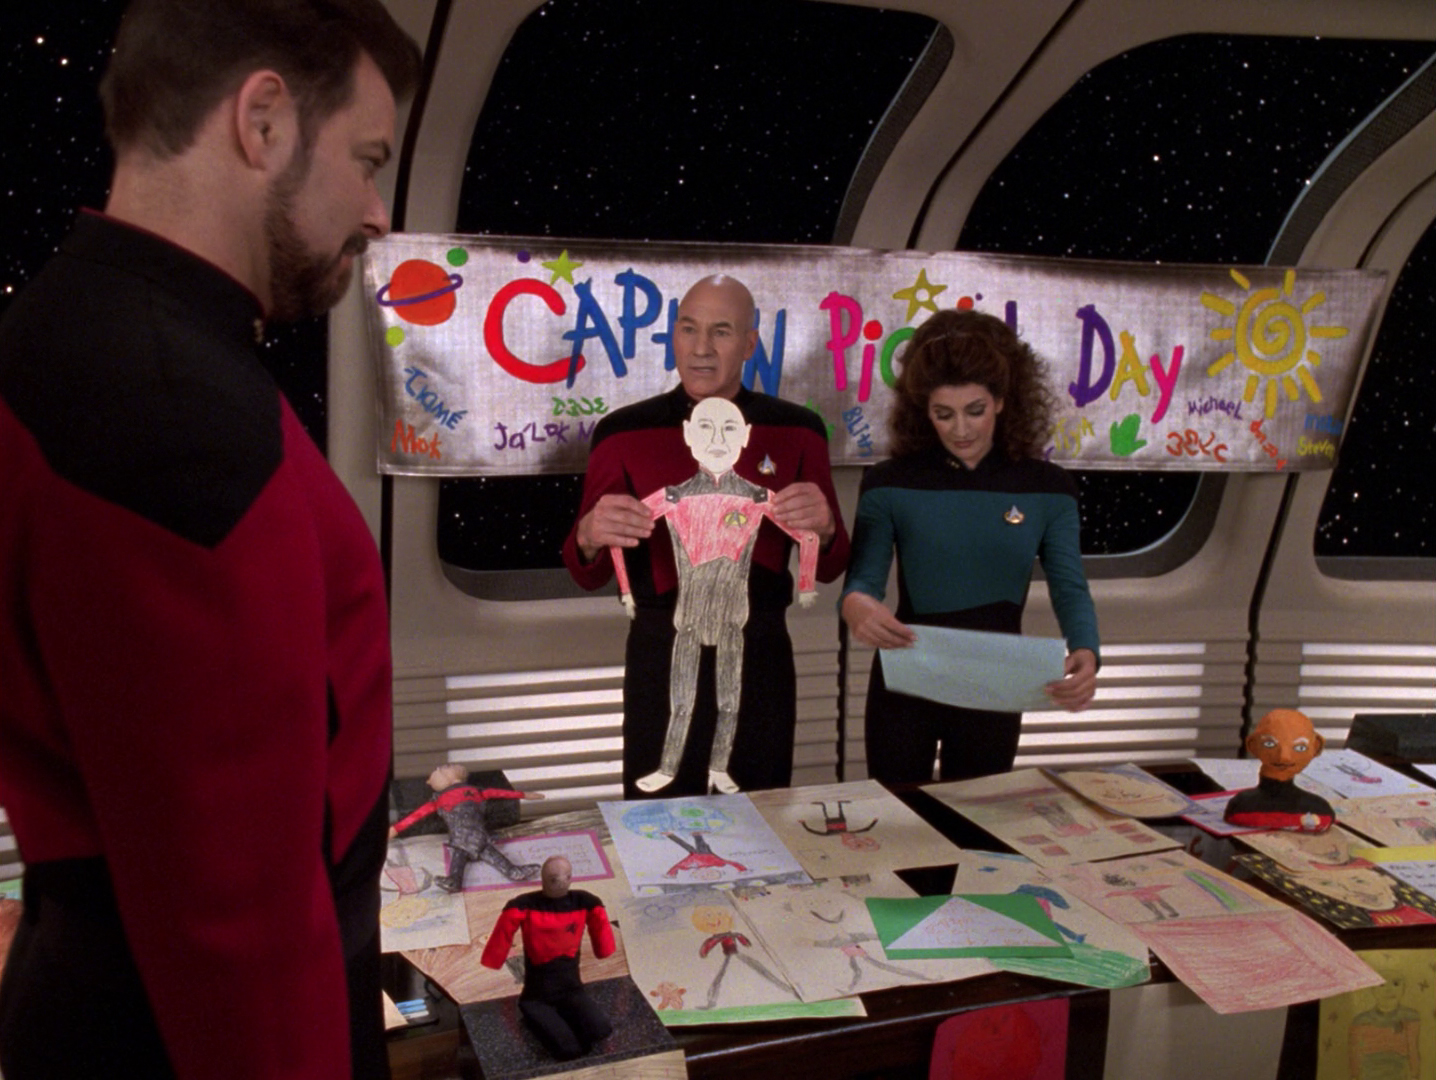 Captain-Picard-Tag.jpg